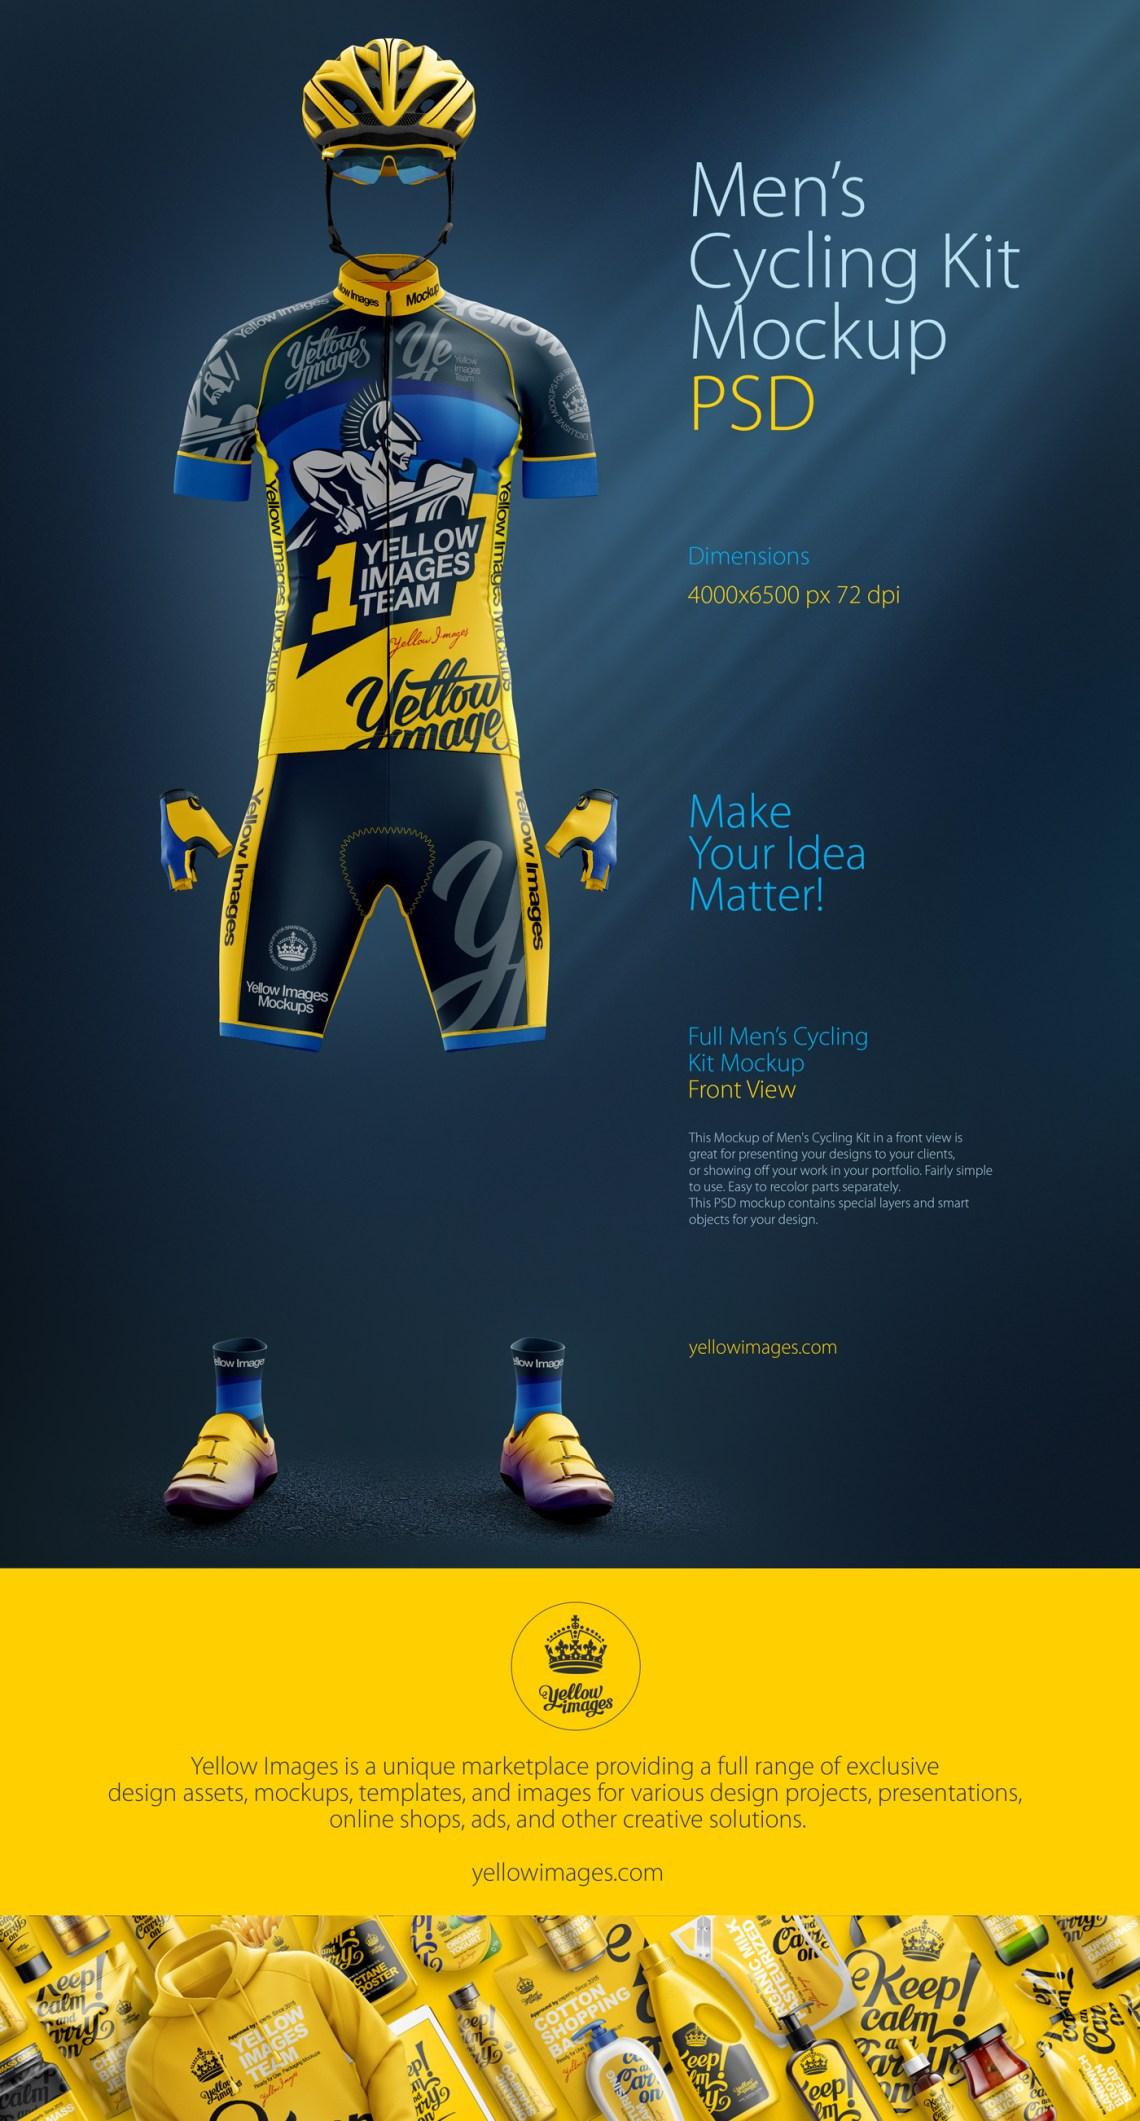 Download Men's Cycling Kit Mockup on Behance